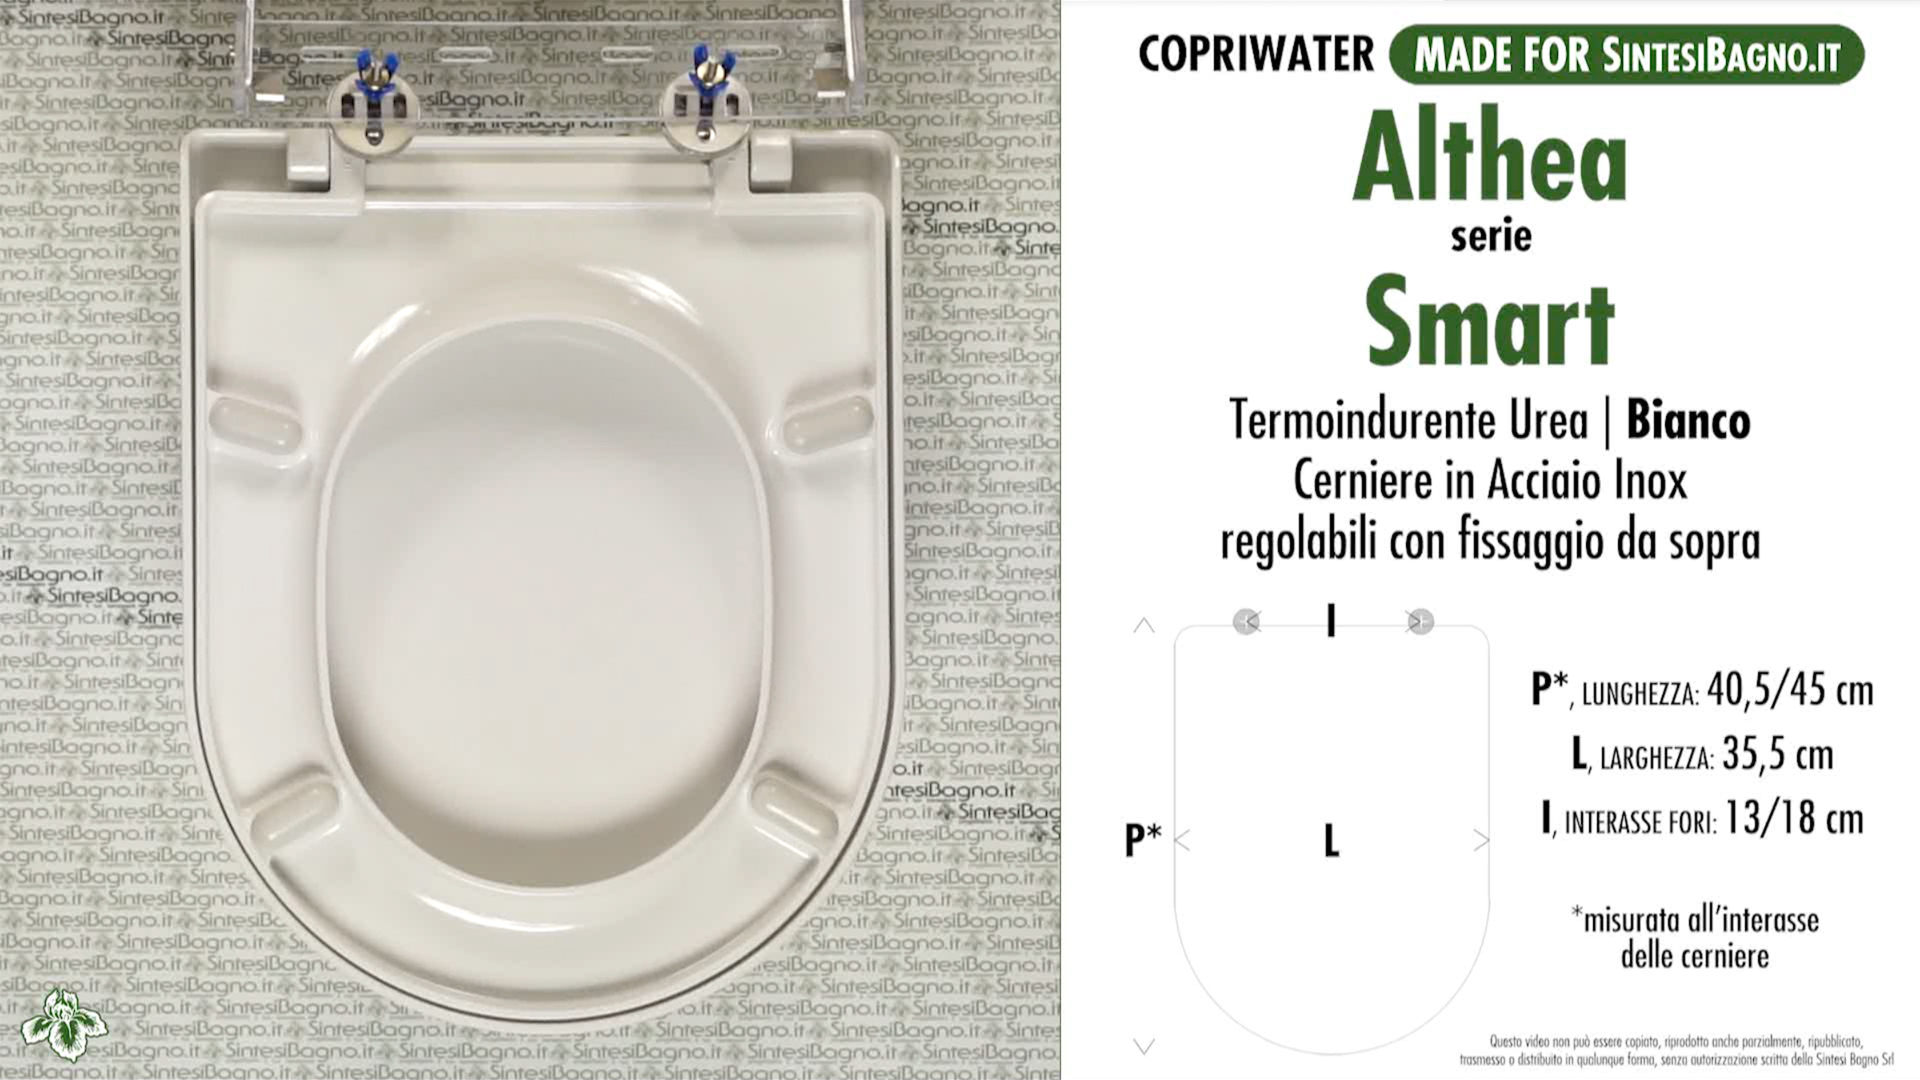 SCHEDA TECNICA MISURE copriwater ALTHEA SMART